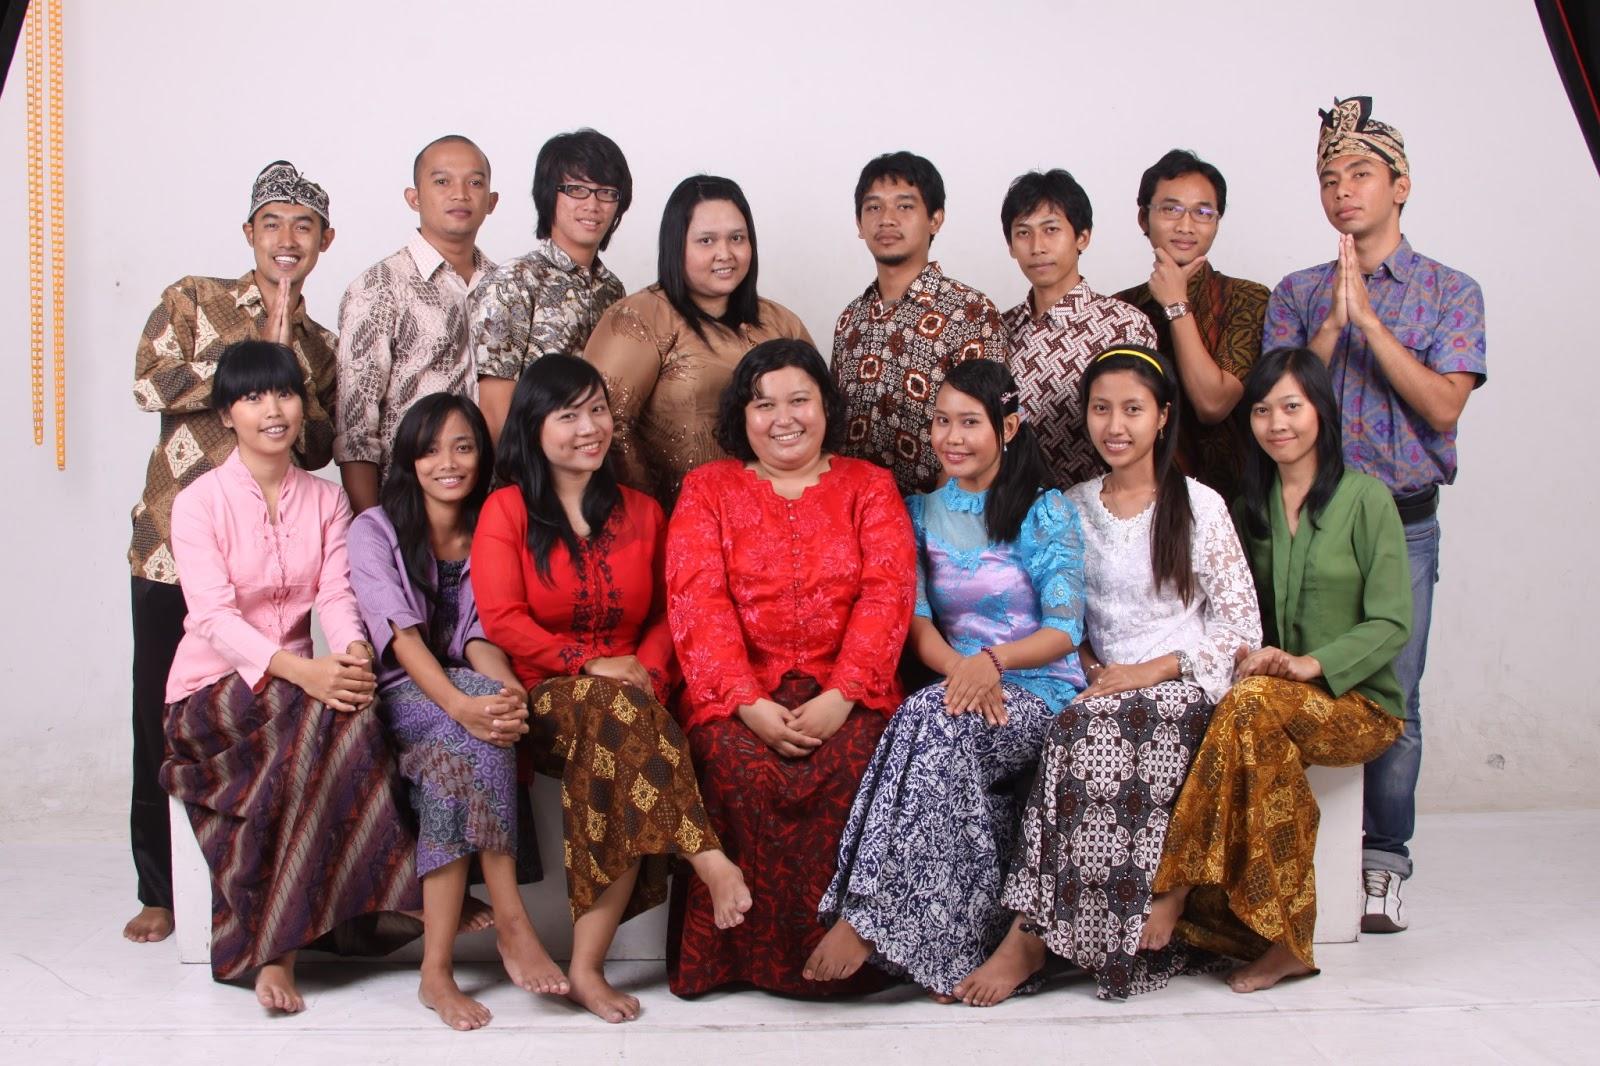 A Noble Philosophy The Unseen Beauty Of Batik Blogika Produk Ukm Bumn Parang Kembang Sebagai Media Refleksi Nilai Kehidupan